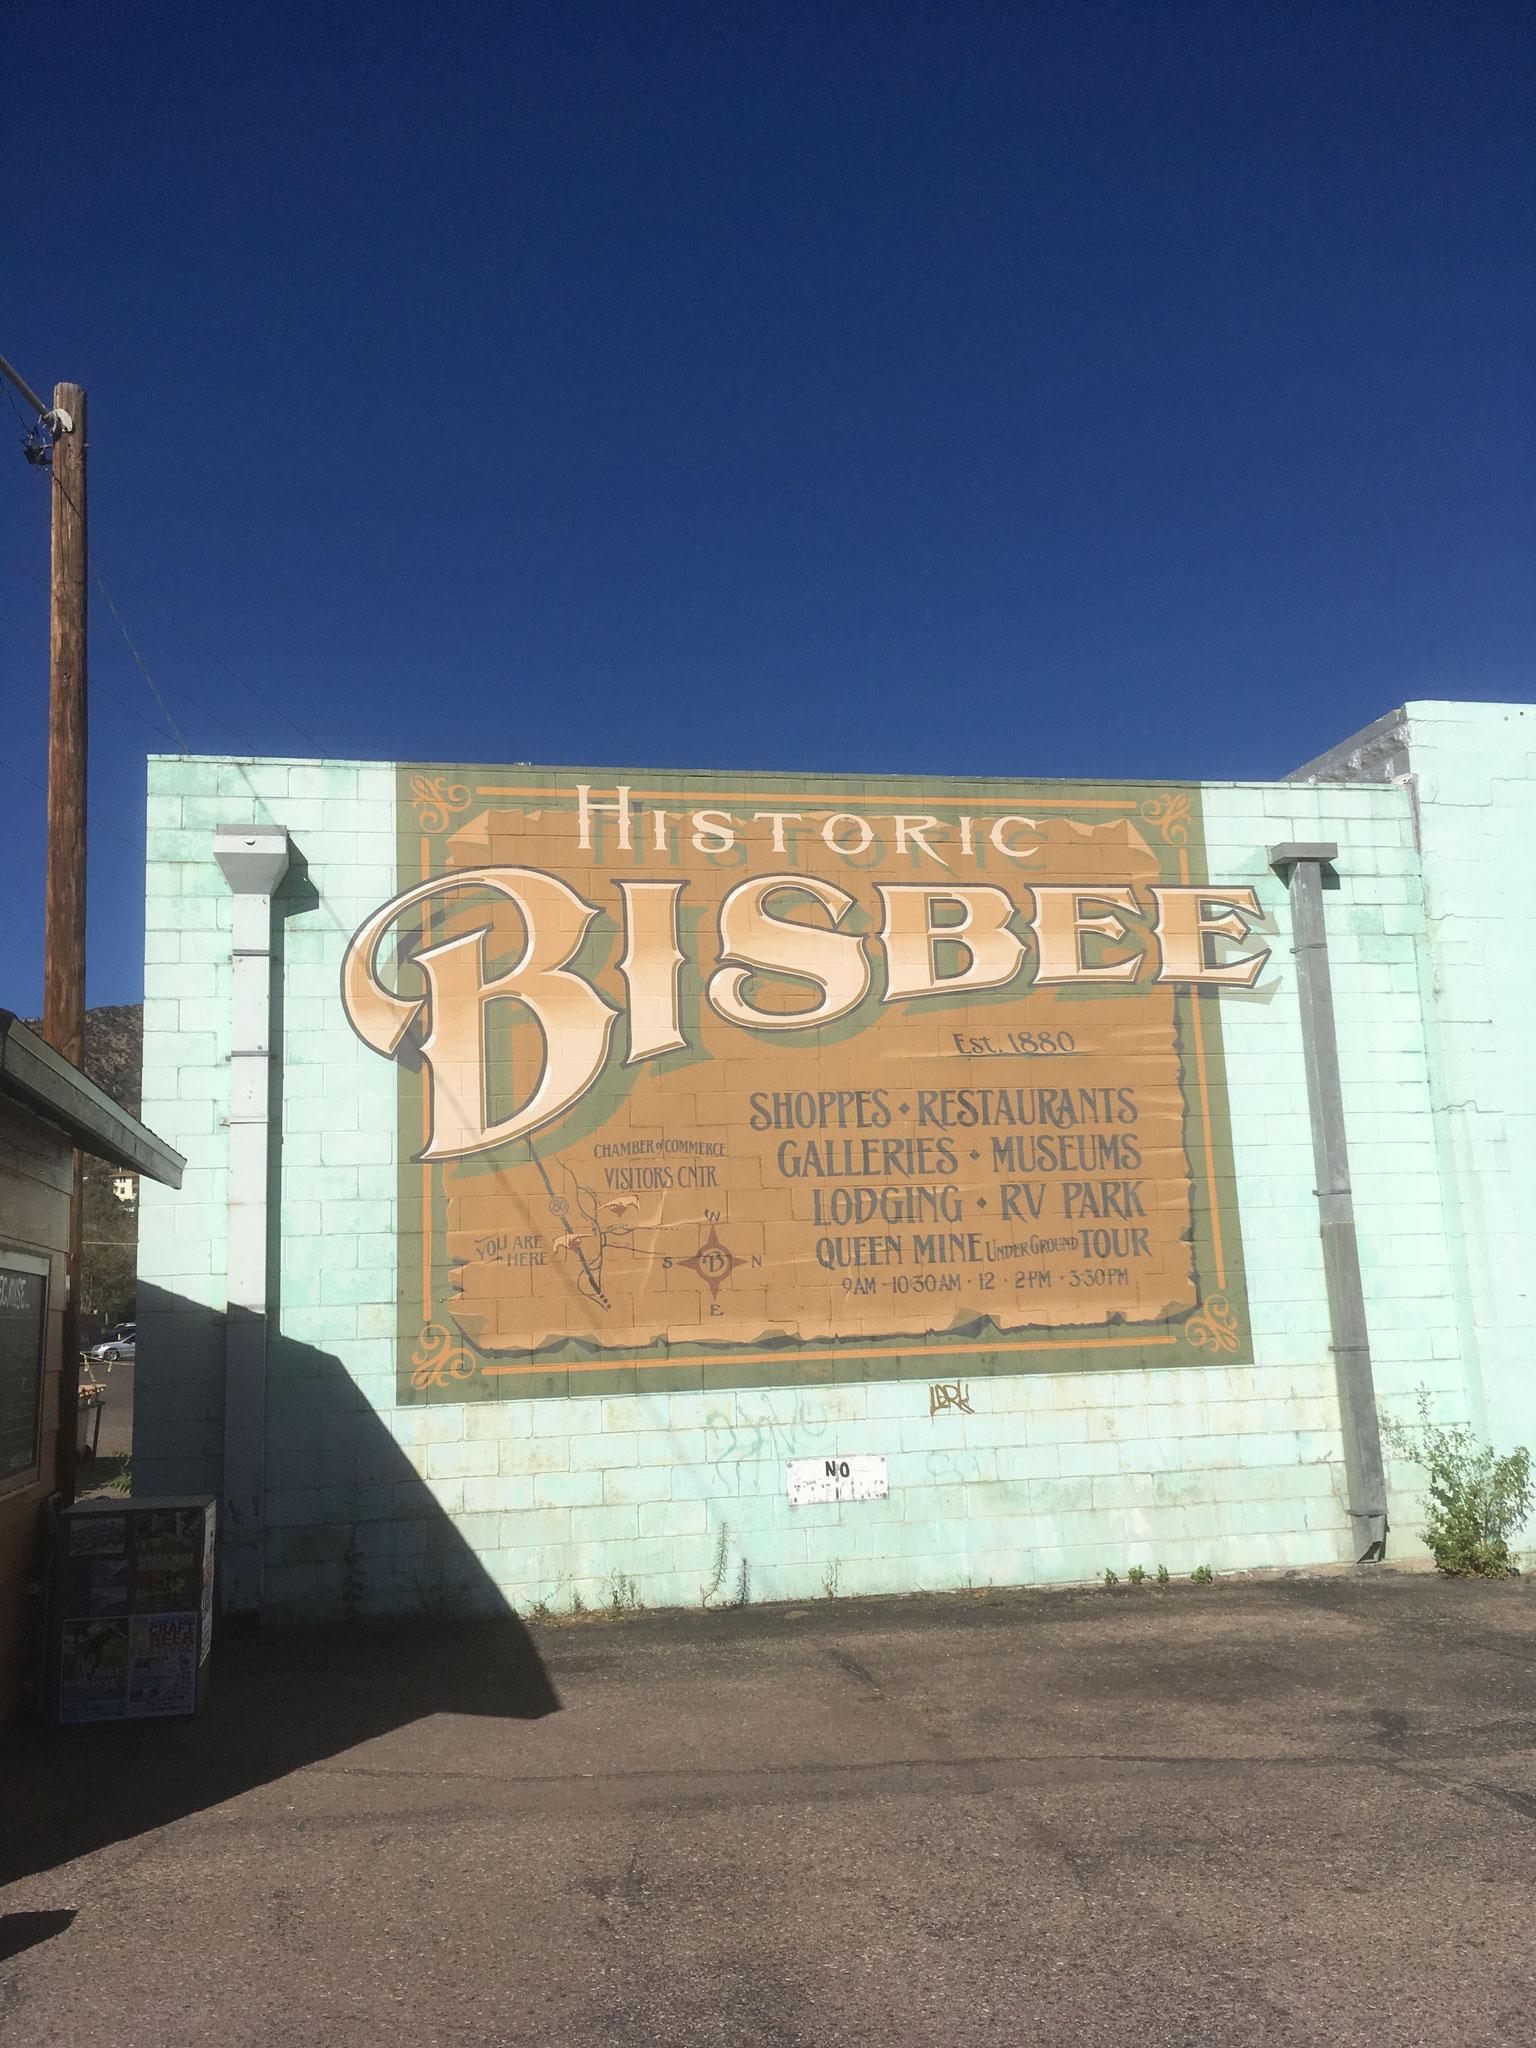 Bisbee Historic